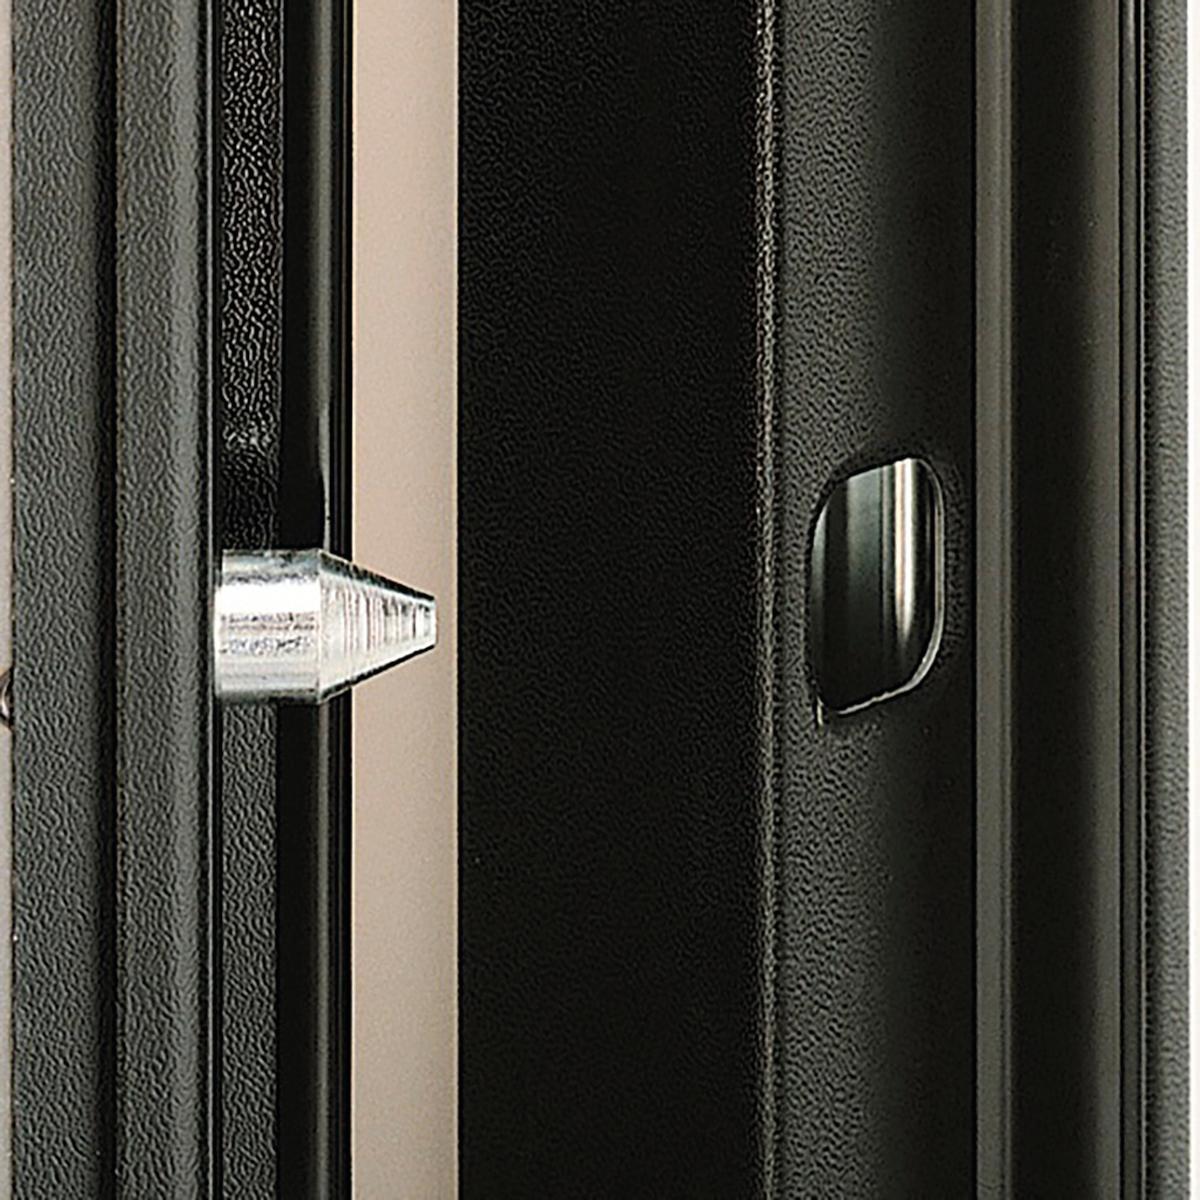 Porta blindata Mirror noce L 90 x H 210 cm destra - 7